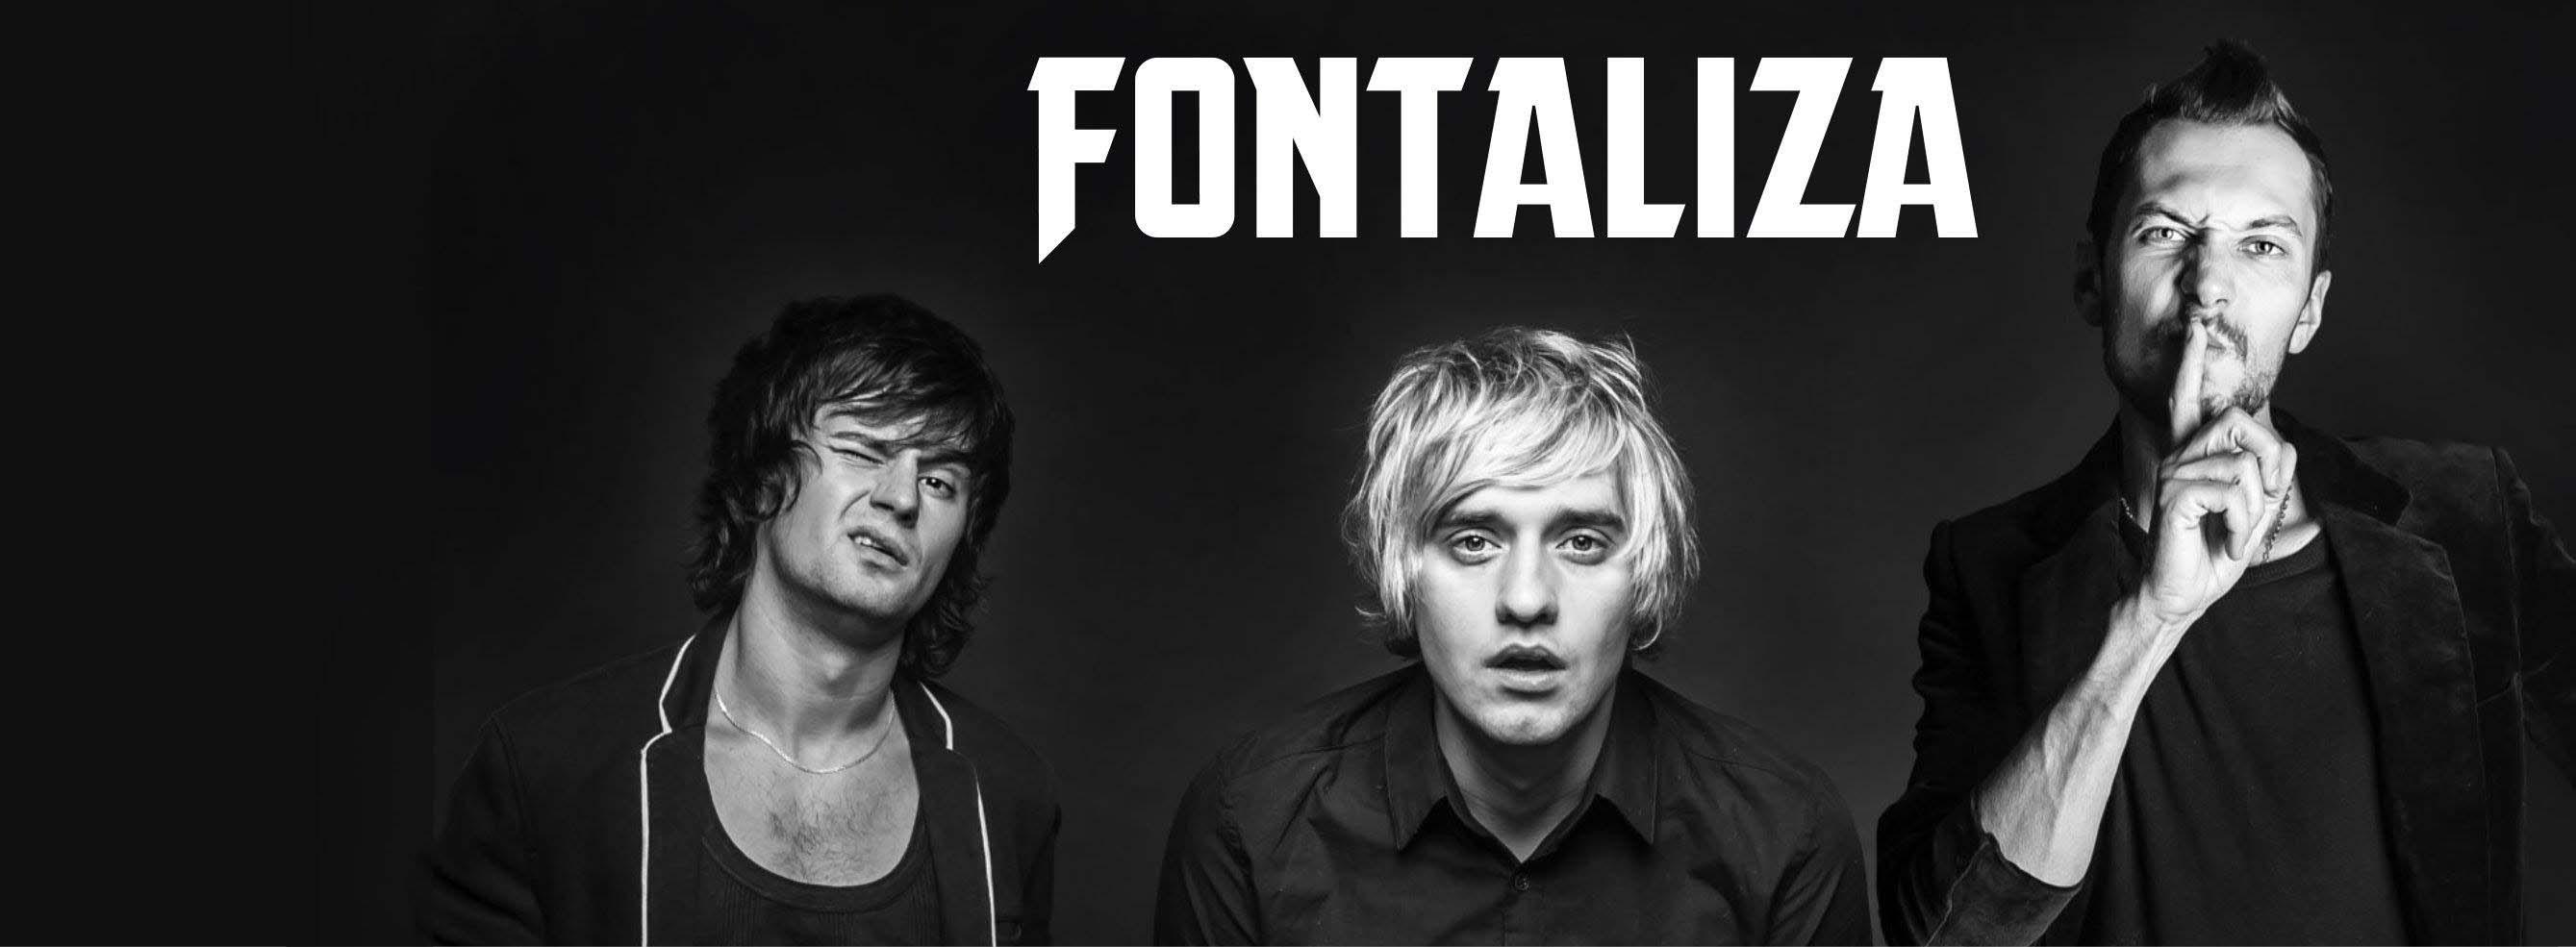 Fontaliza7 Fontaliza — UA MUSIC | Енциклопедія української музики